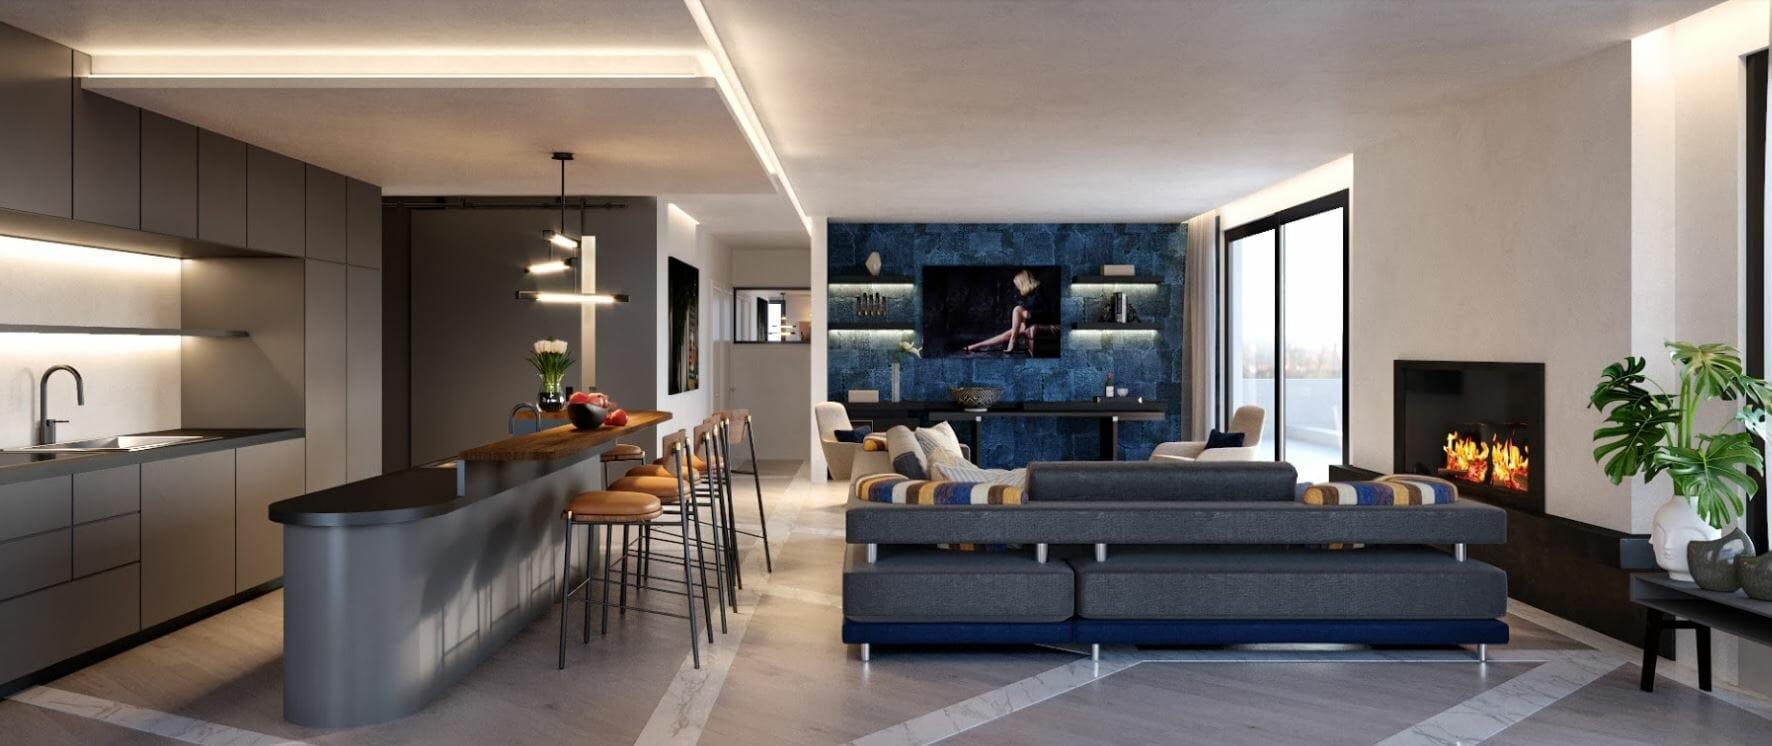 decorilla vs modsy comparison 3d renderings modern living room